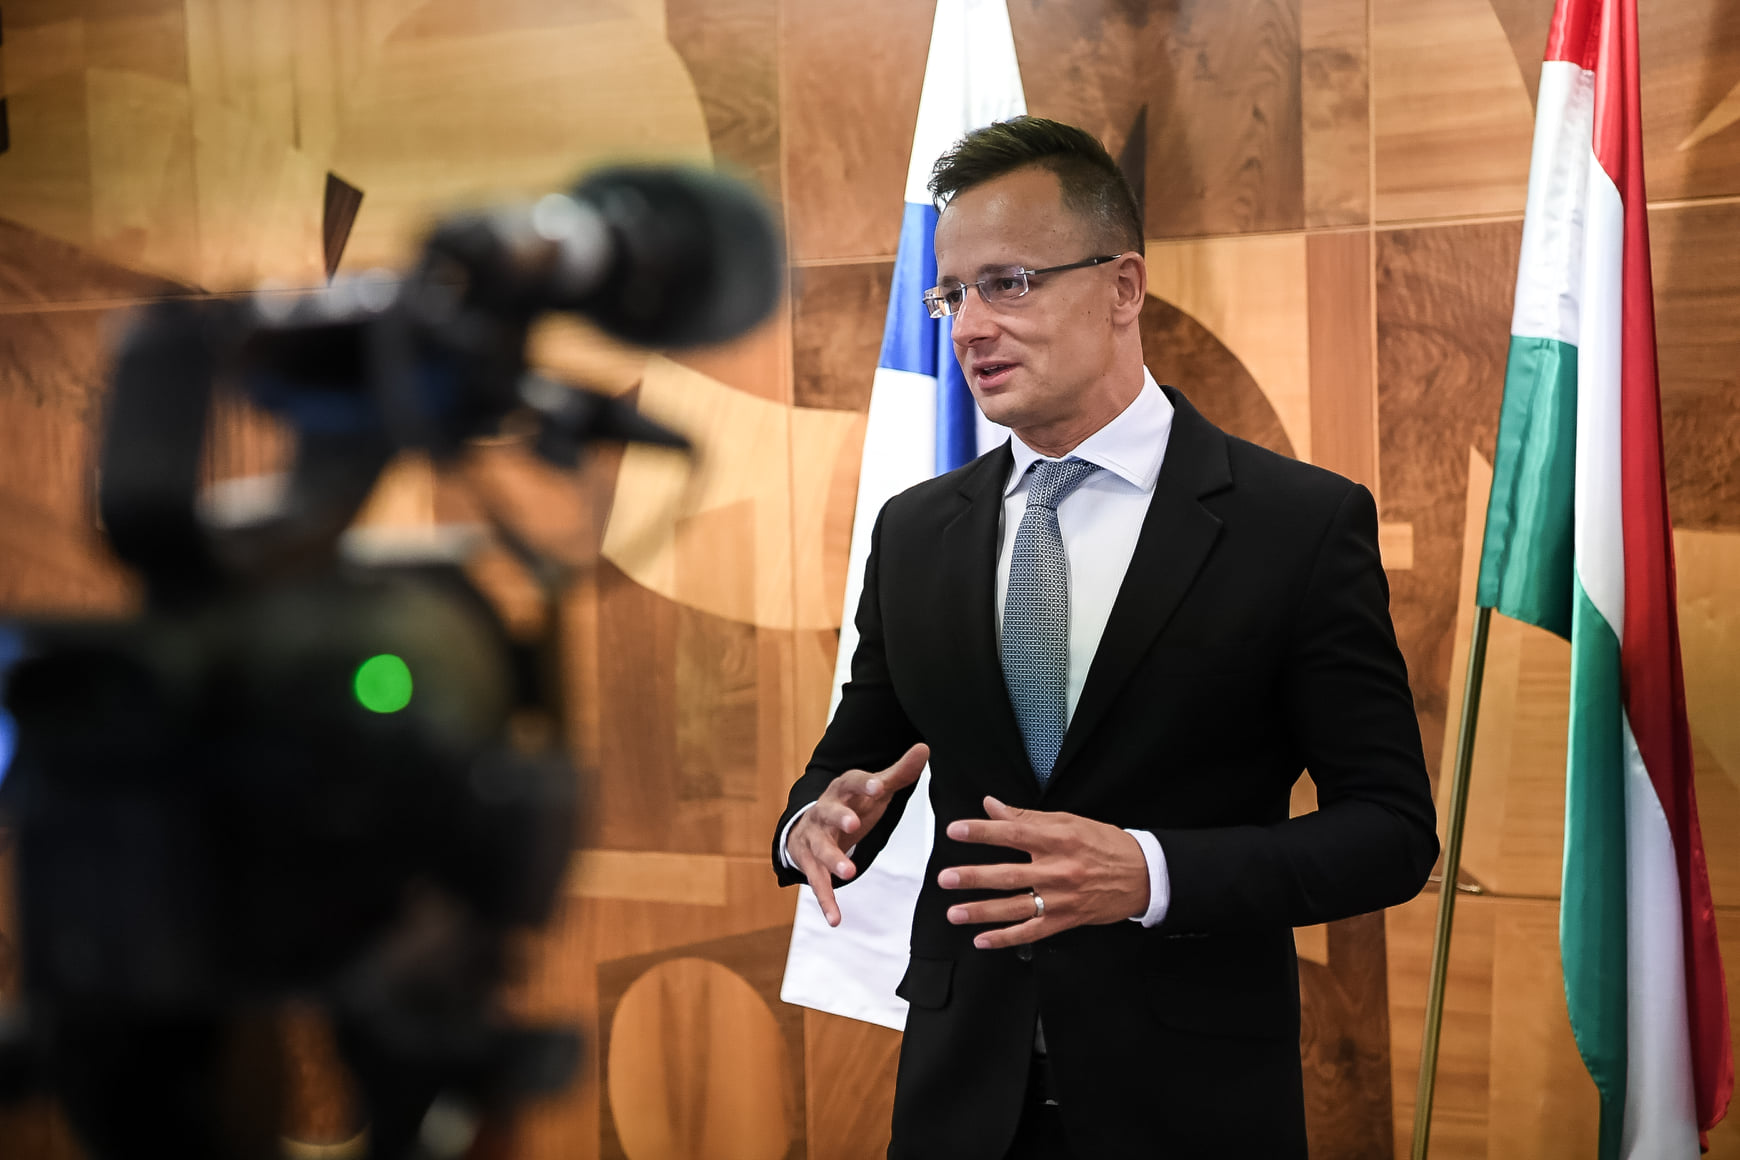 FM Szijjártó: Europe Facing Growing Migration Pressure from Multiple Directions